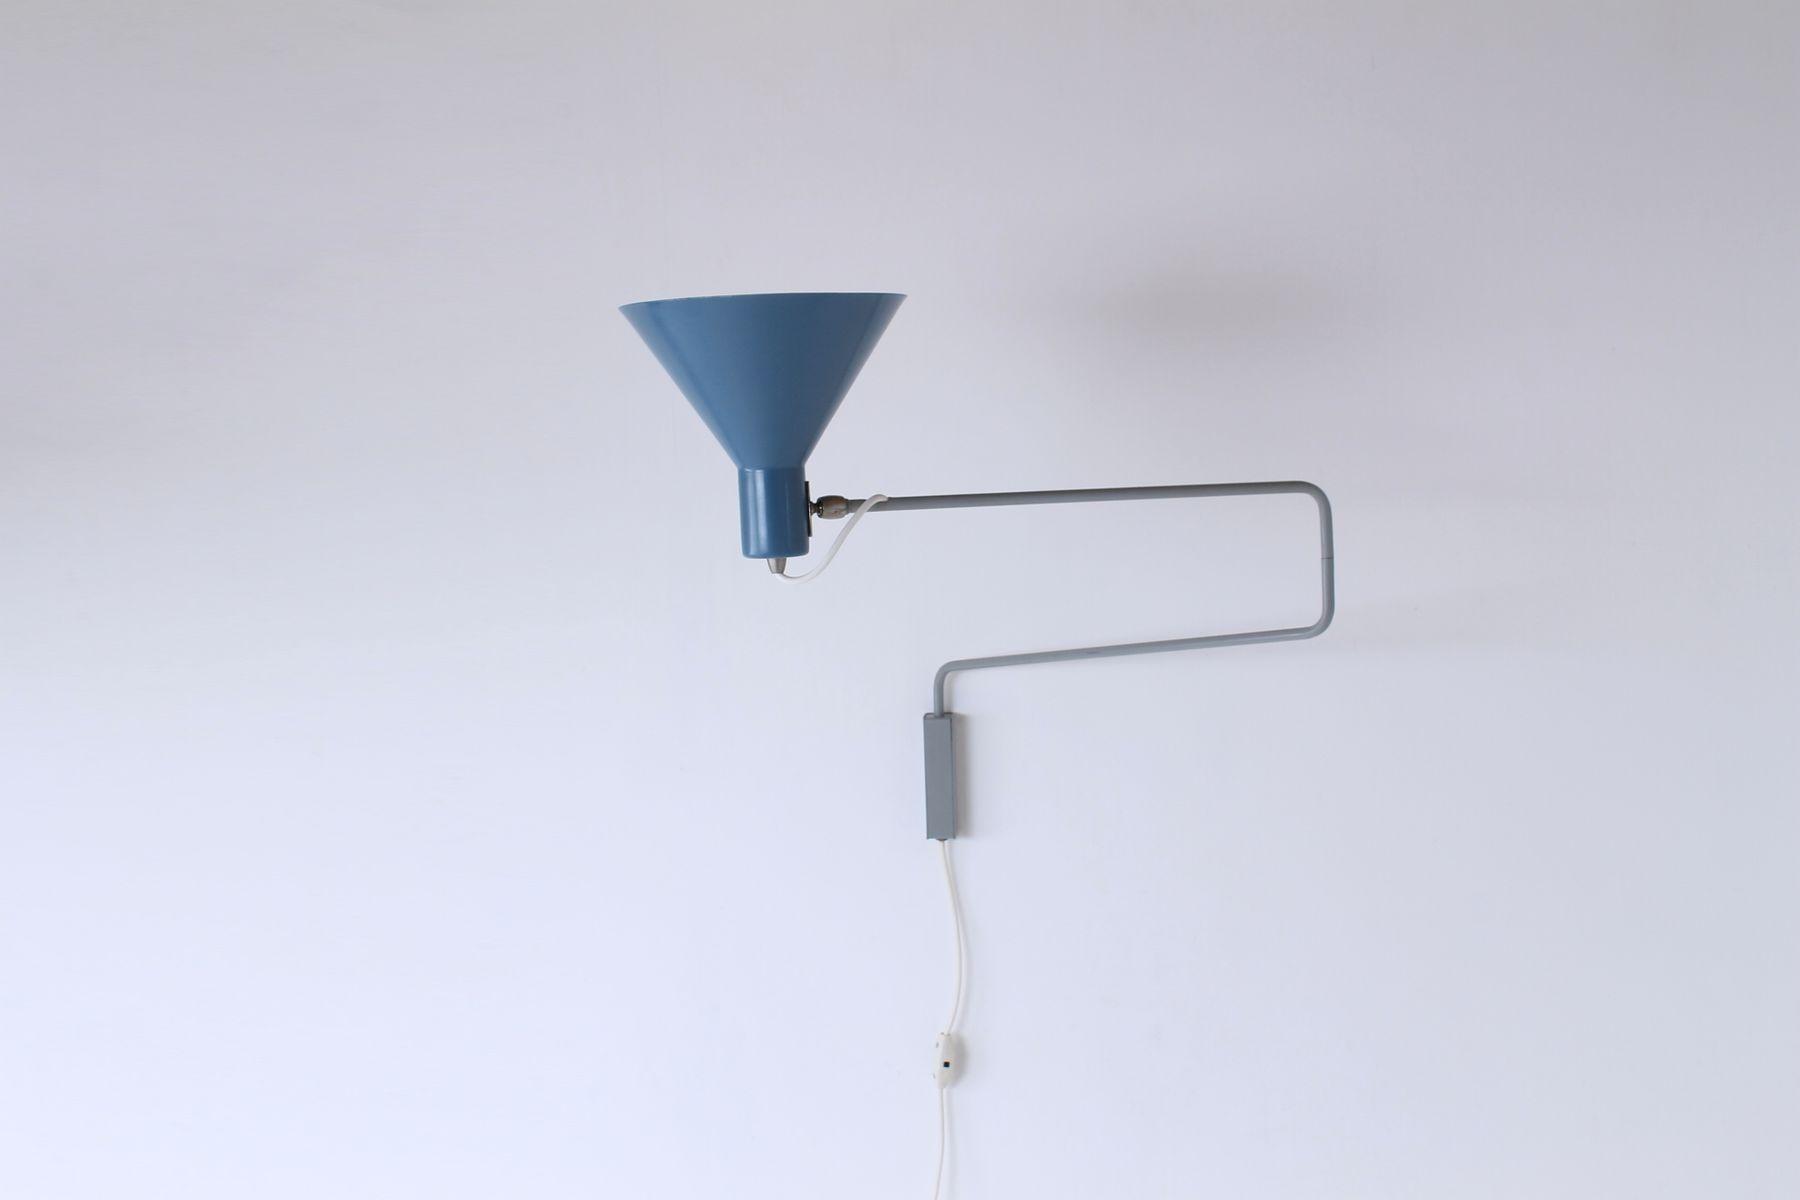 Vintage Petrol Blue Paperclip Elbow Wall Light by J. J. M. Hoogervorst for Anvia for sale at Pamono